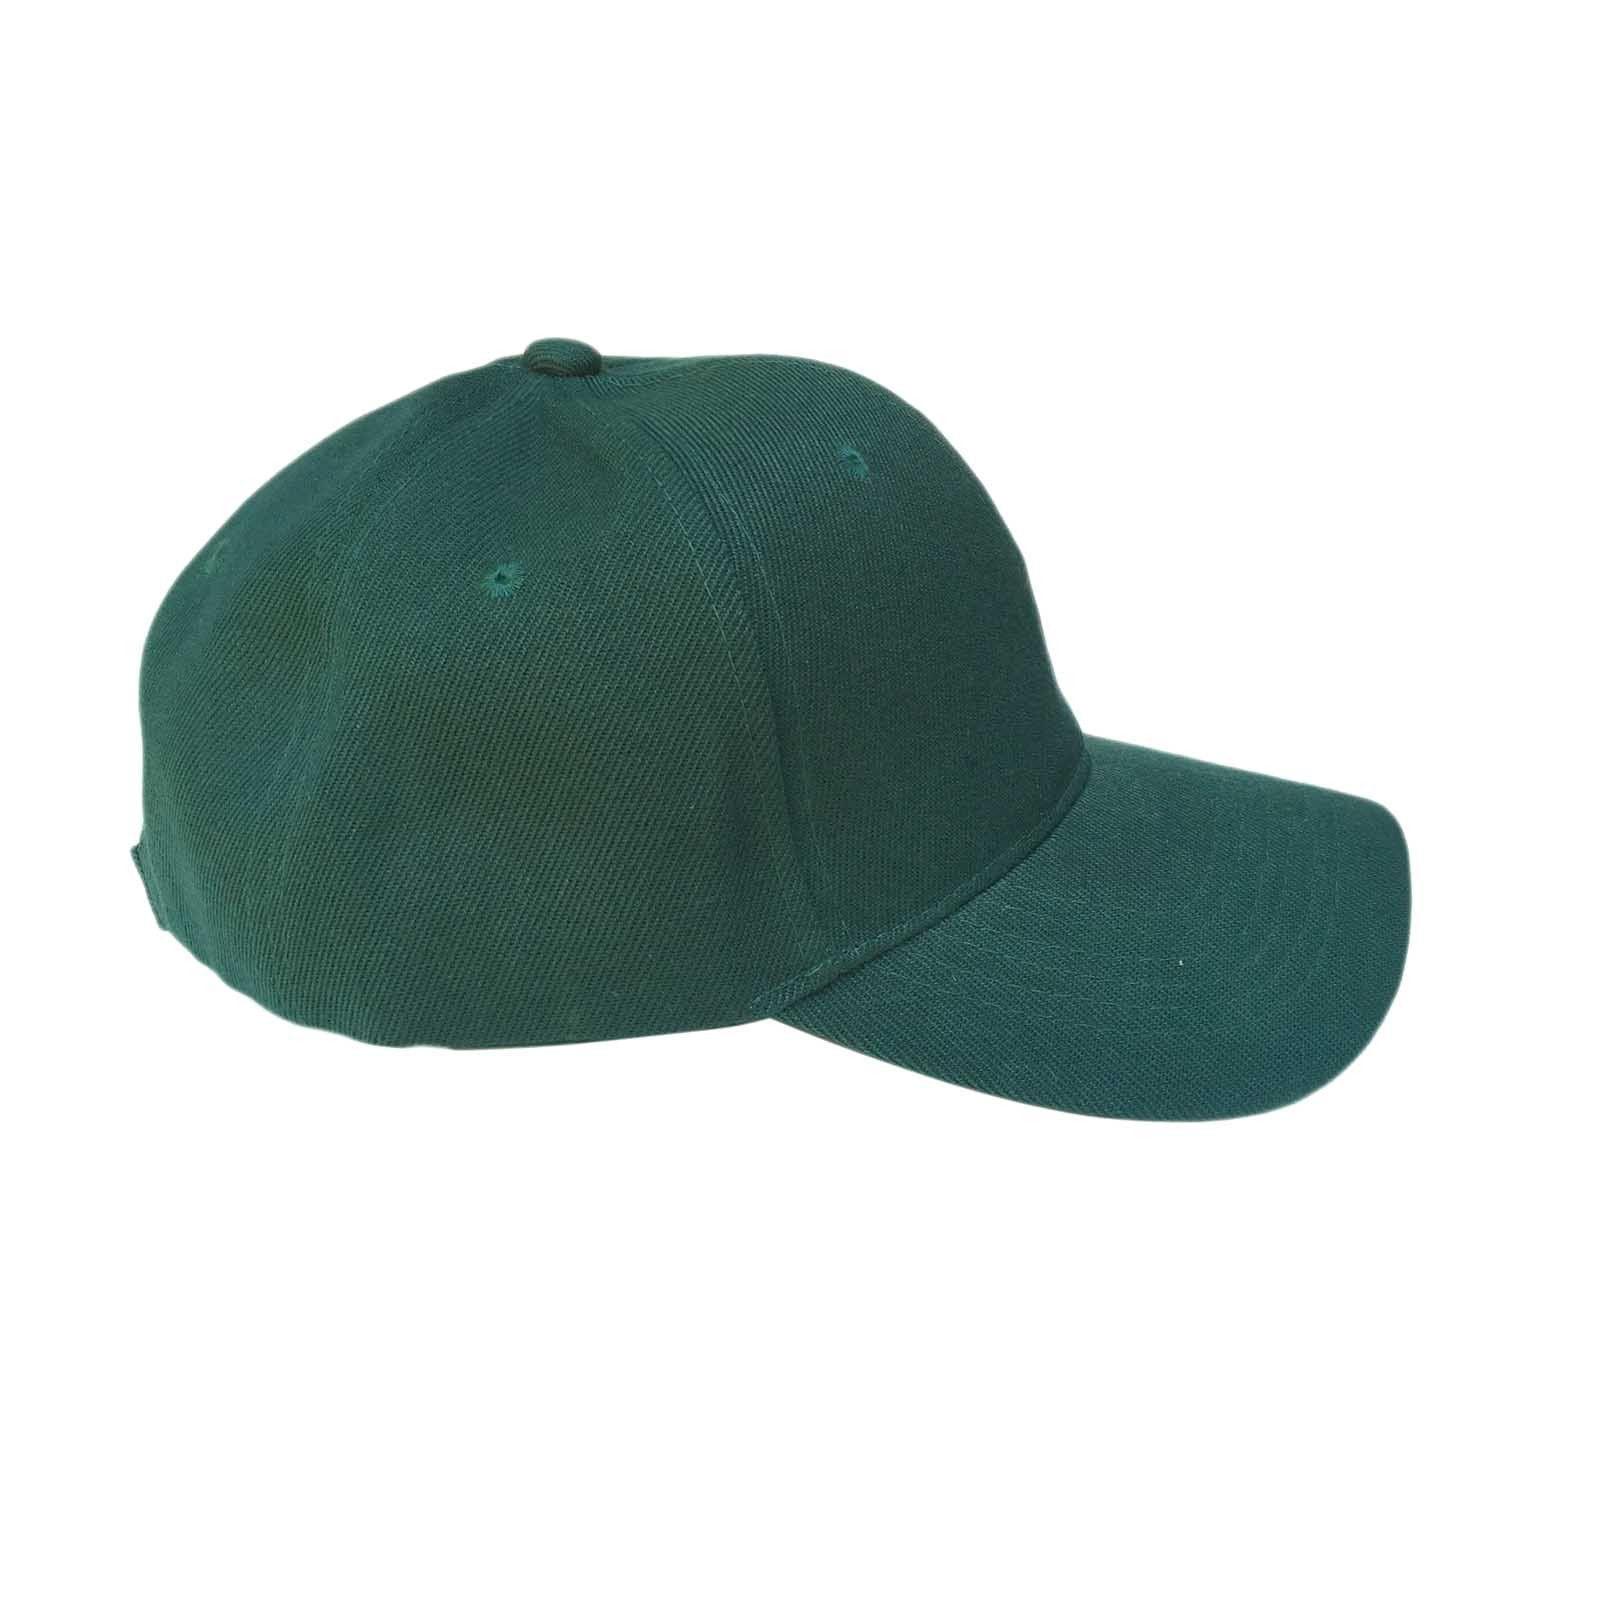 Plain Blank Ball Baseball Adjustable Cap Hat Baseball Caps Hats New 1SZ FIT b199791e2469